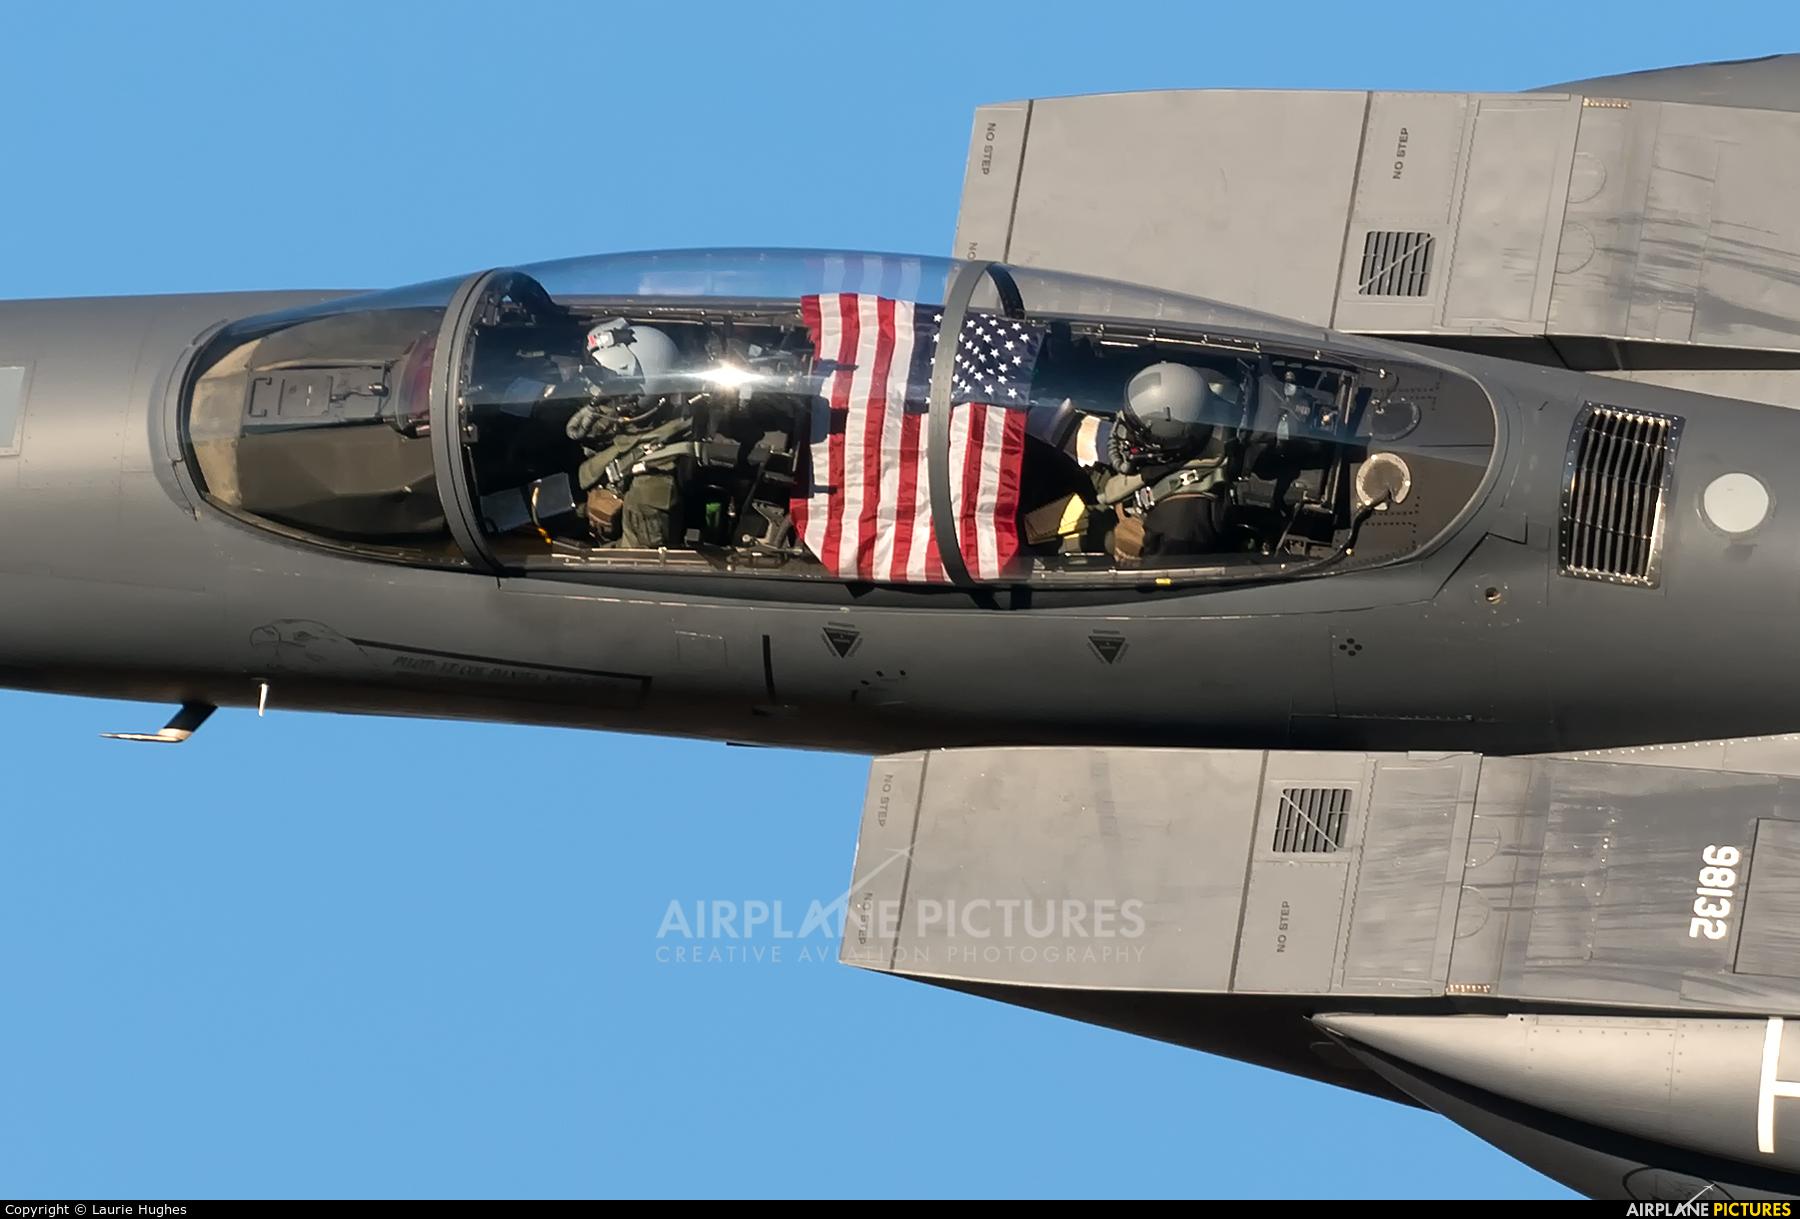 USA - Air Force 98-0132 aircraft at Machynlleth Loop - LFA 7